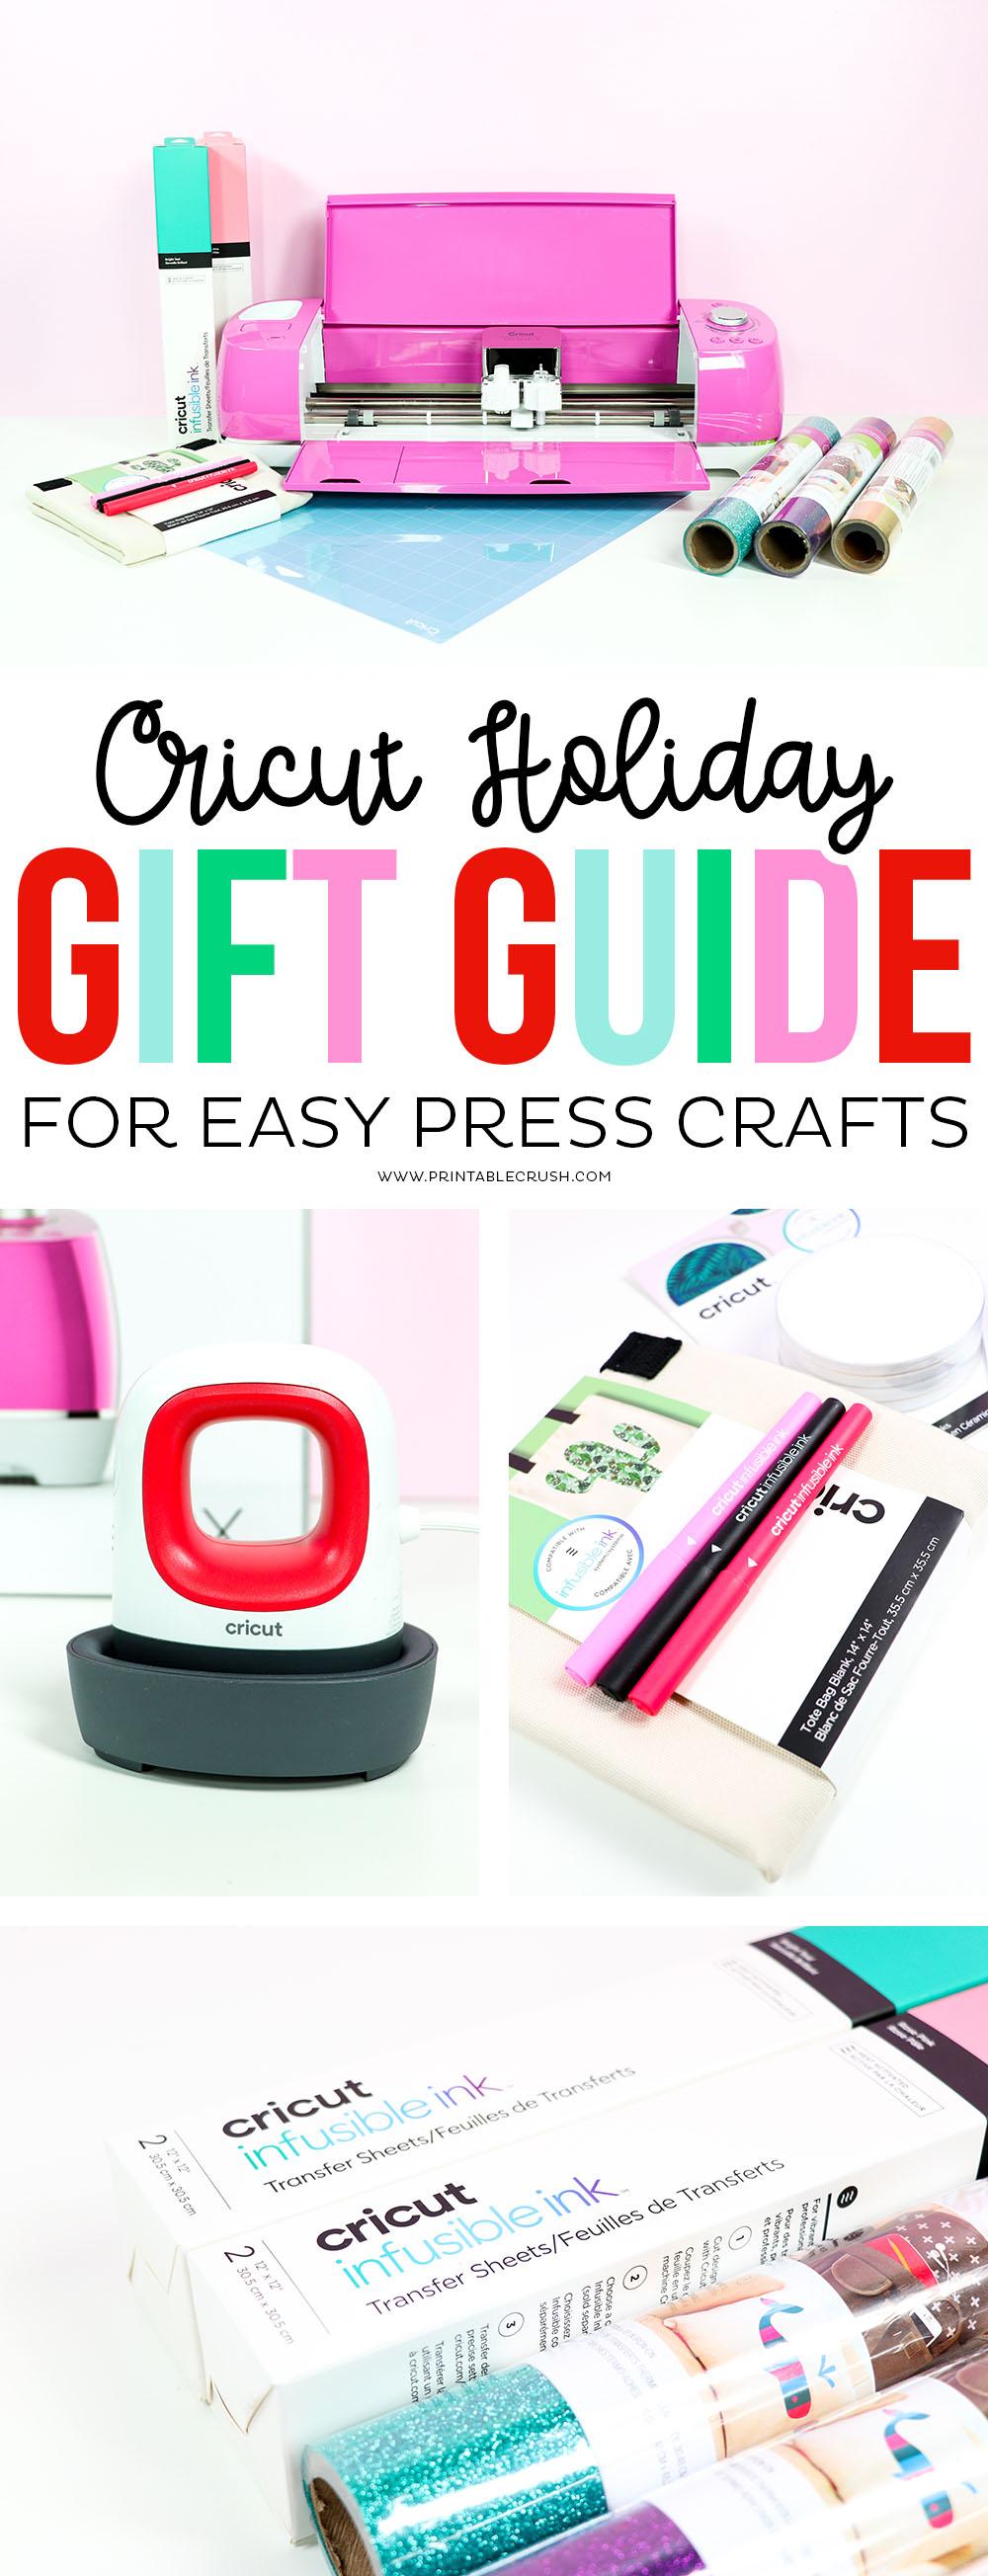 Cricut Gift Guide for EasyPress Fanatics #cricutgiftguide #holidaygiftguide #giftguide #cricutmade #cricutcrafts #christmasgiftguide #giftideas #christmasgifts #craftgifts #craftgiftguide